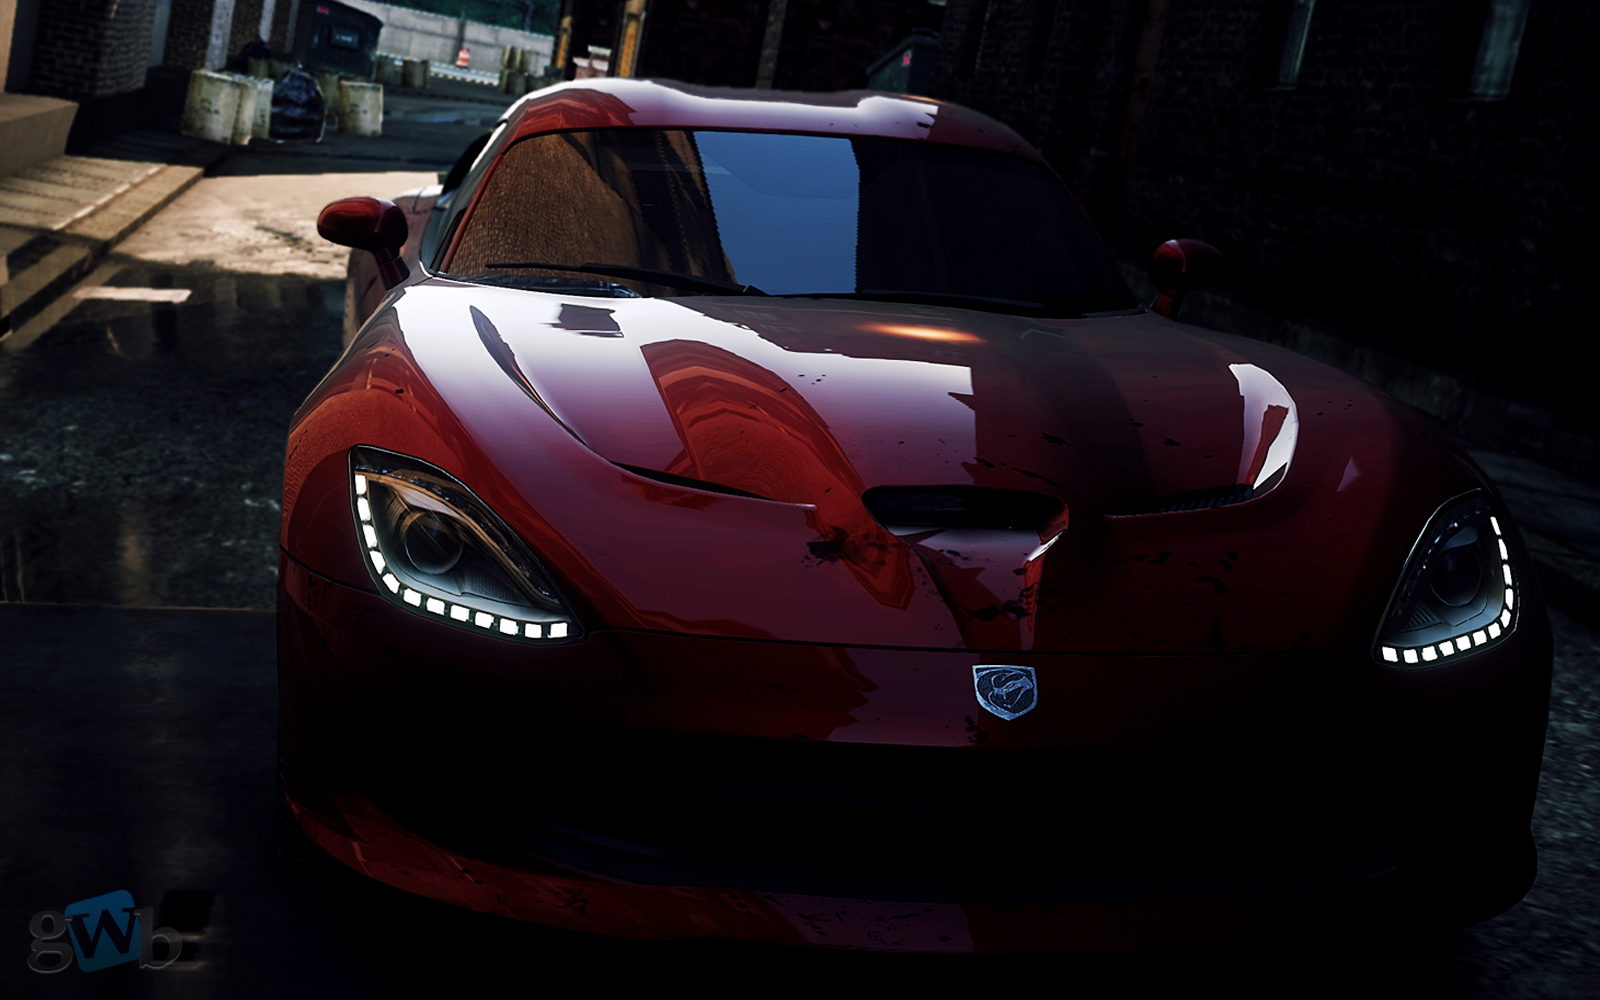 http://2.bp.blogspot.com/-3Wy9gWdEl6A/T9J7c8VeZvI/AAAAAAAACHI/YkanyTg7hBU/s1600/Most_Wanted_2012_Red_Sport_Car_HD_Wallpaper-gWb.jpg